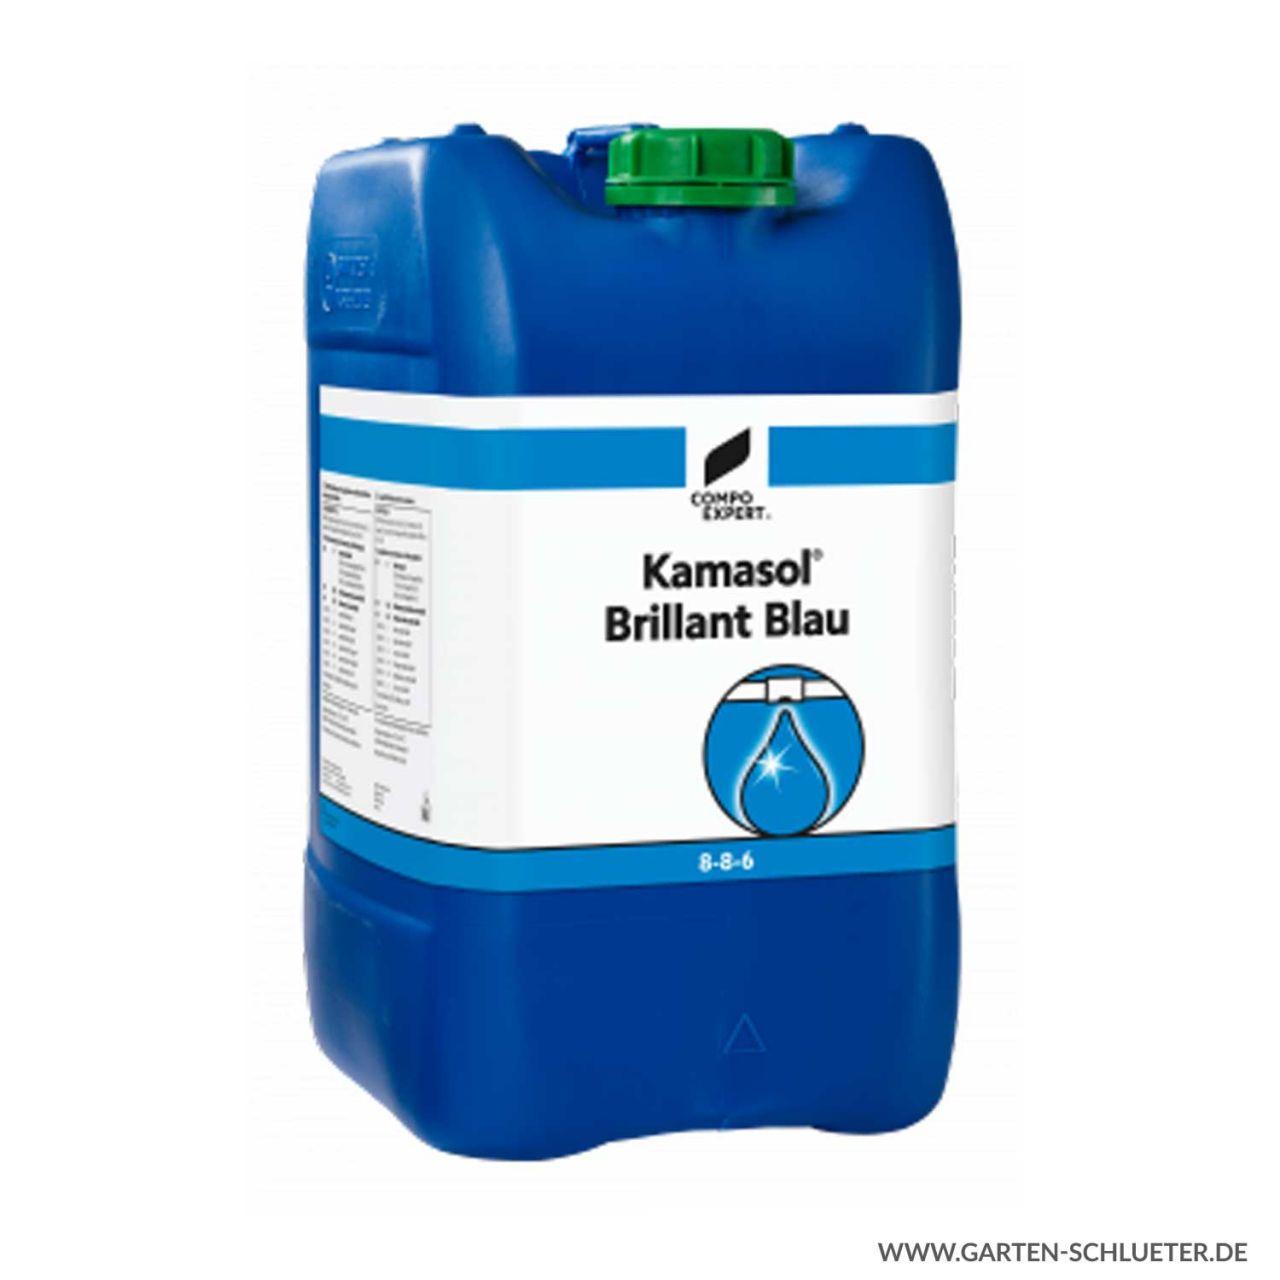 Flüssigdünger - Compo Expert® Kamasol® Brillant 8-8-6 - 20 Liter